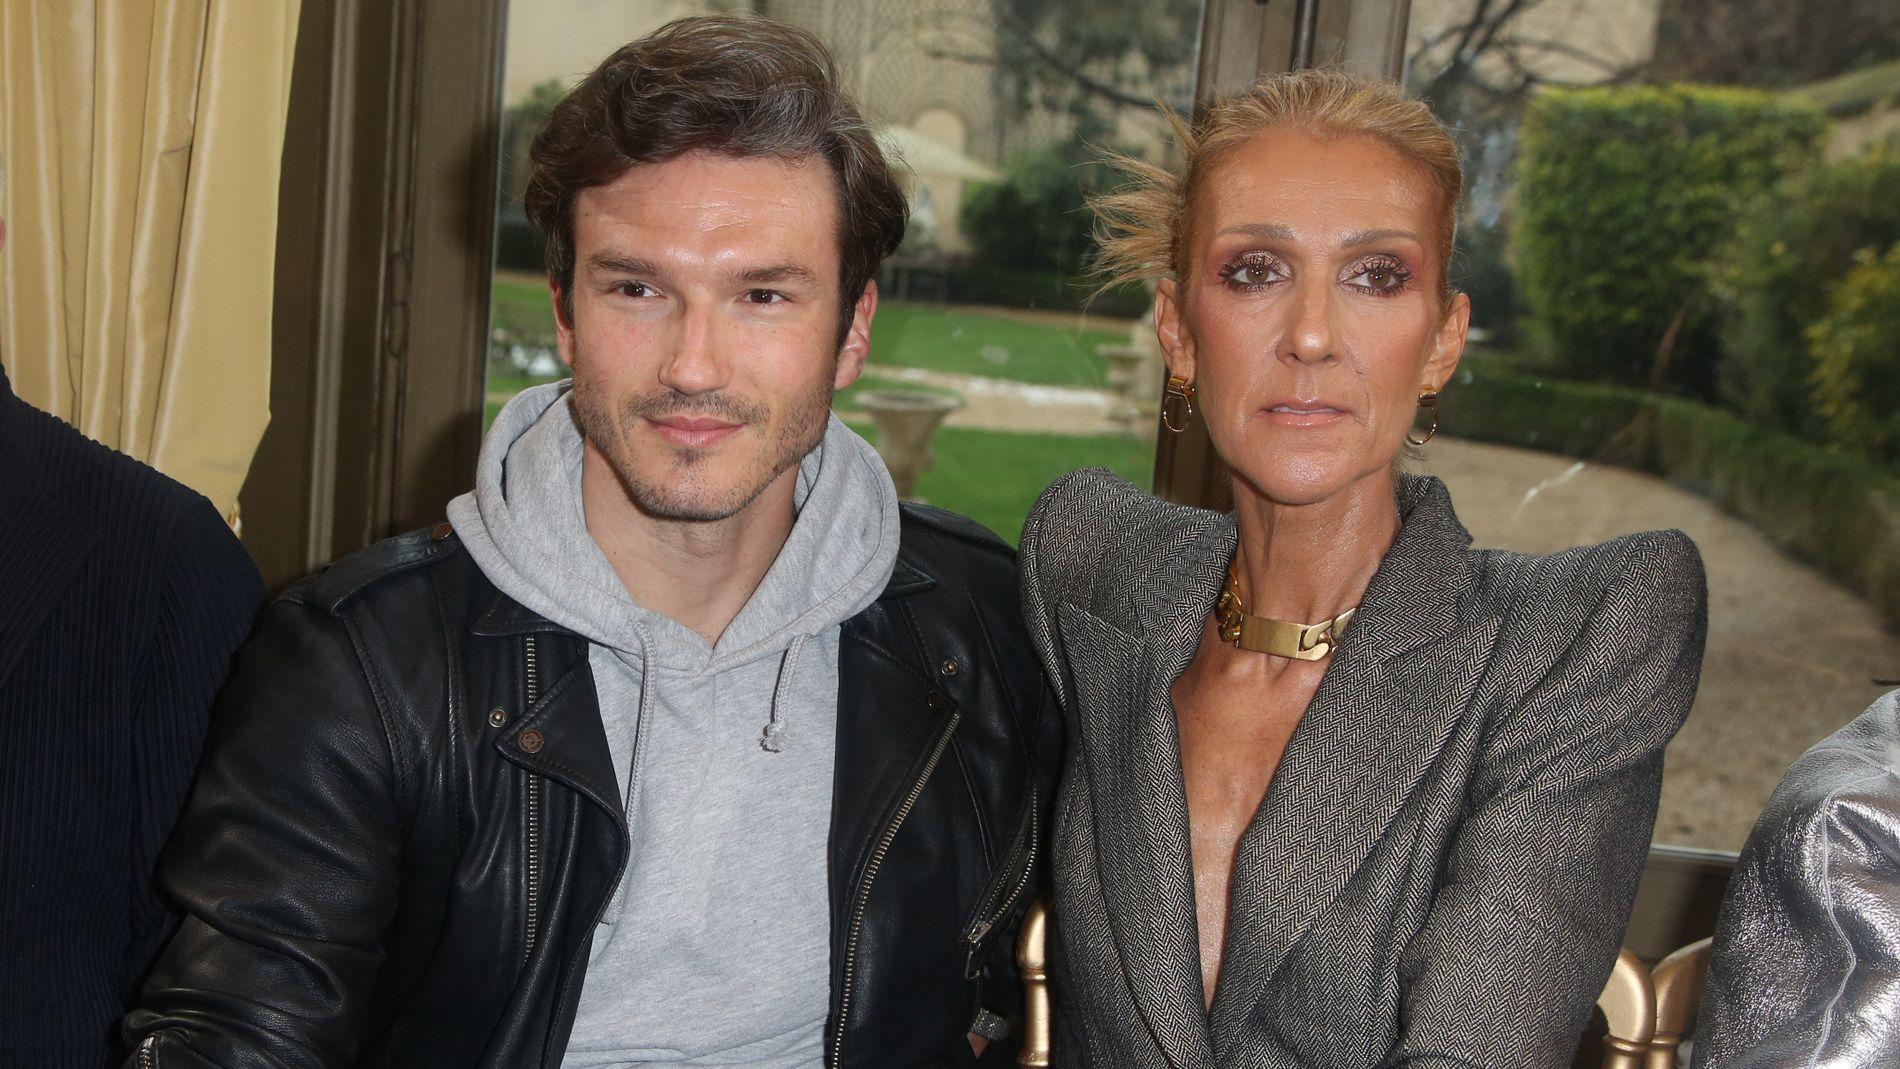 e1d0a91c Céline Dion etter romanseryktene: – Han er homofil